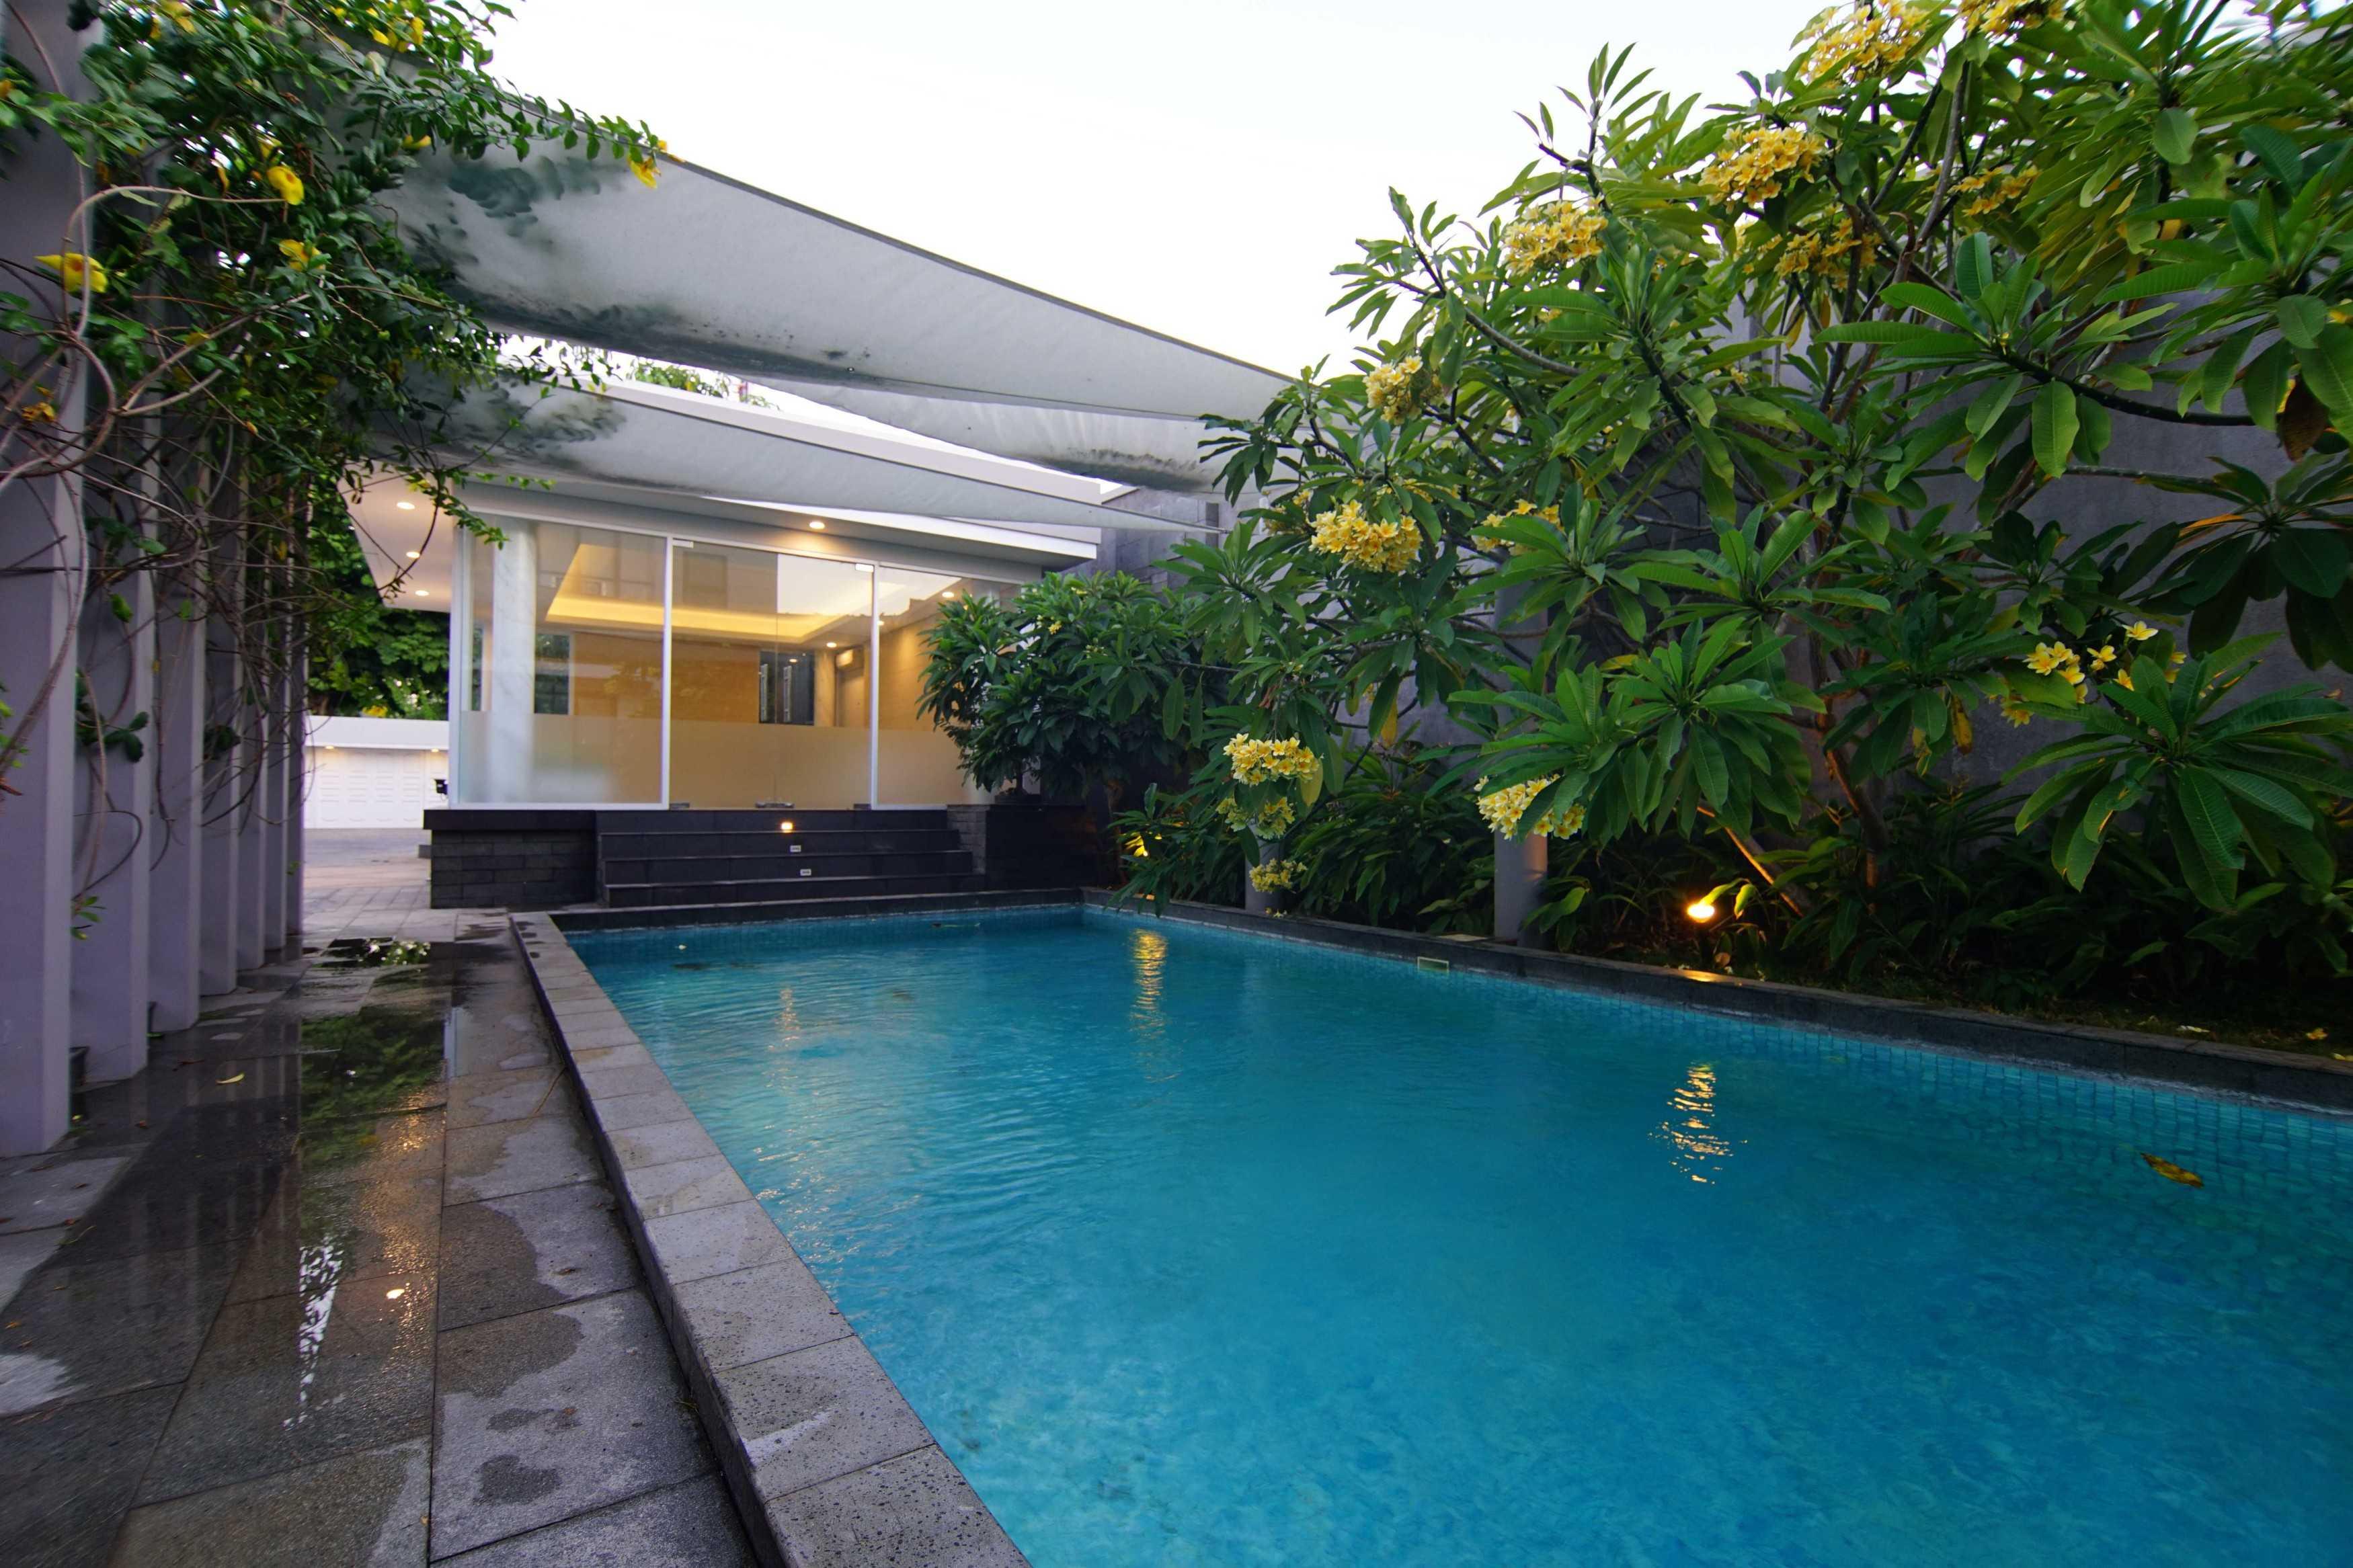 .nicky Setiabudi Architect (Muse  Design) Pl House Kabupaten Tuban, Jawa Timur, Indonesia Kabupaten Tuban, Jawa Timur, Indonesia Pool View From Praying Room   50012